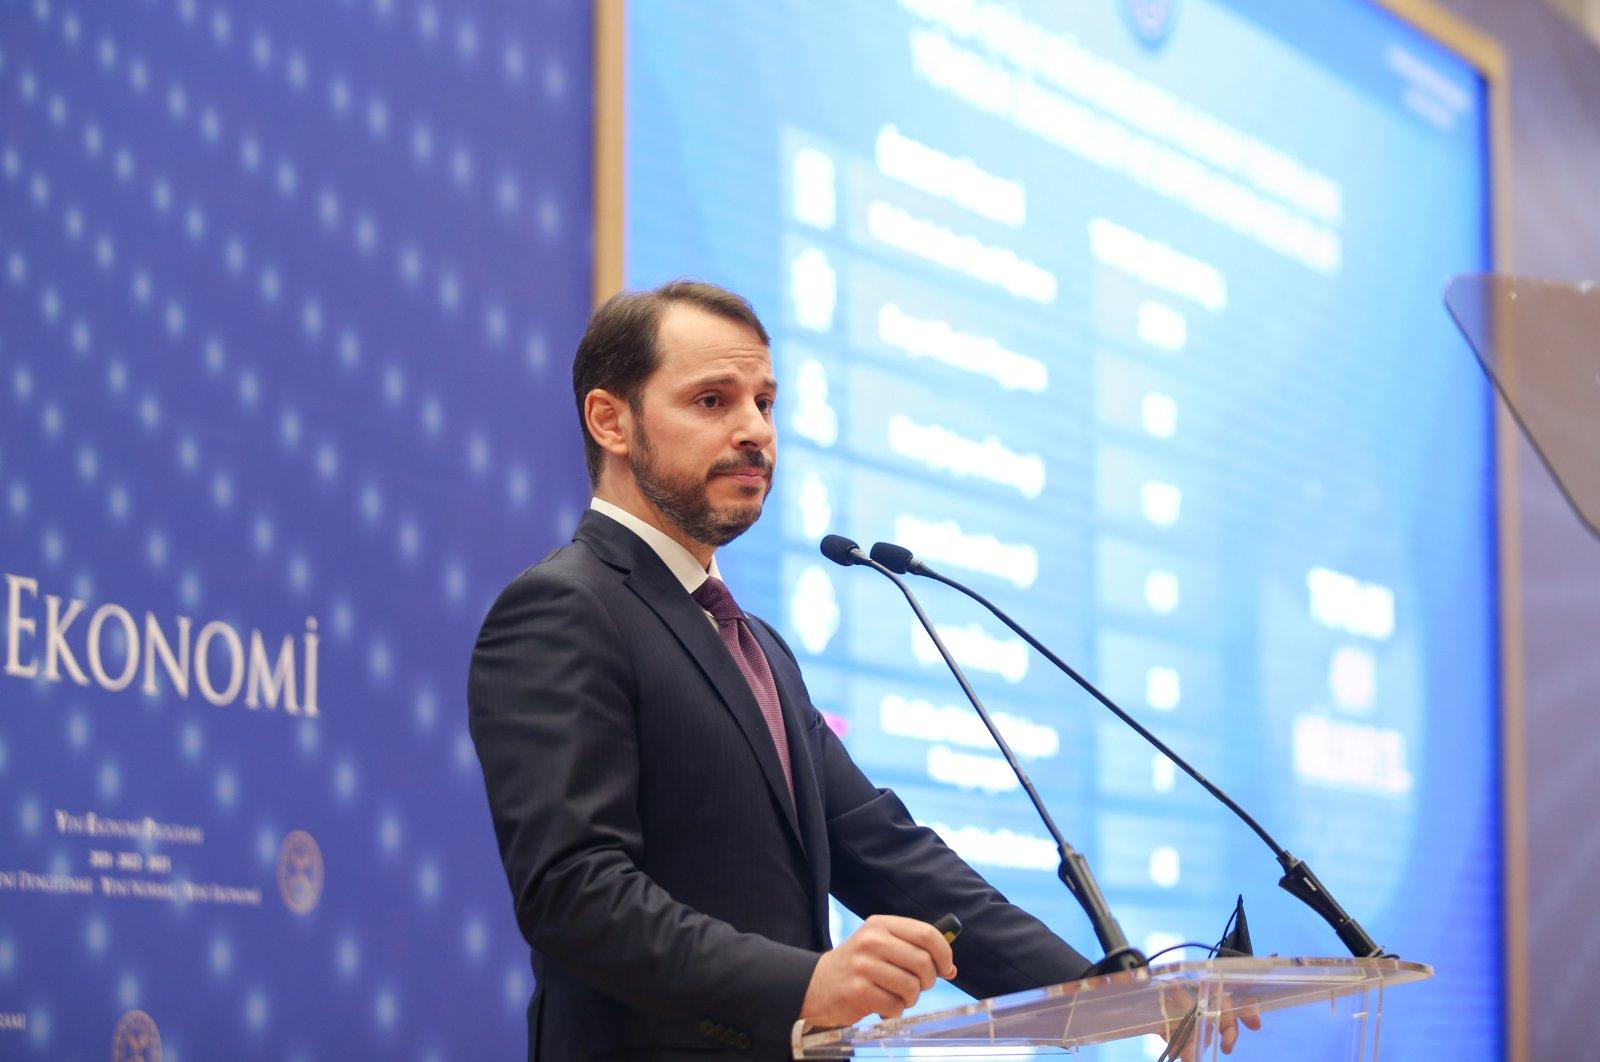 Treasury and Finance Minister Berat Albayrak presenting the new economic program in Ataşehir, Istanbul, Sept. 29, 2020. (AA Photo)